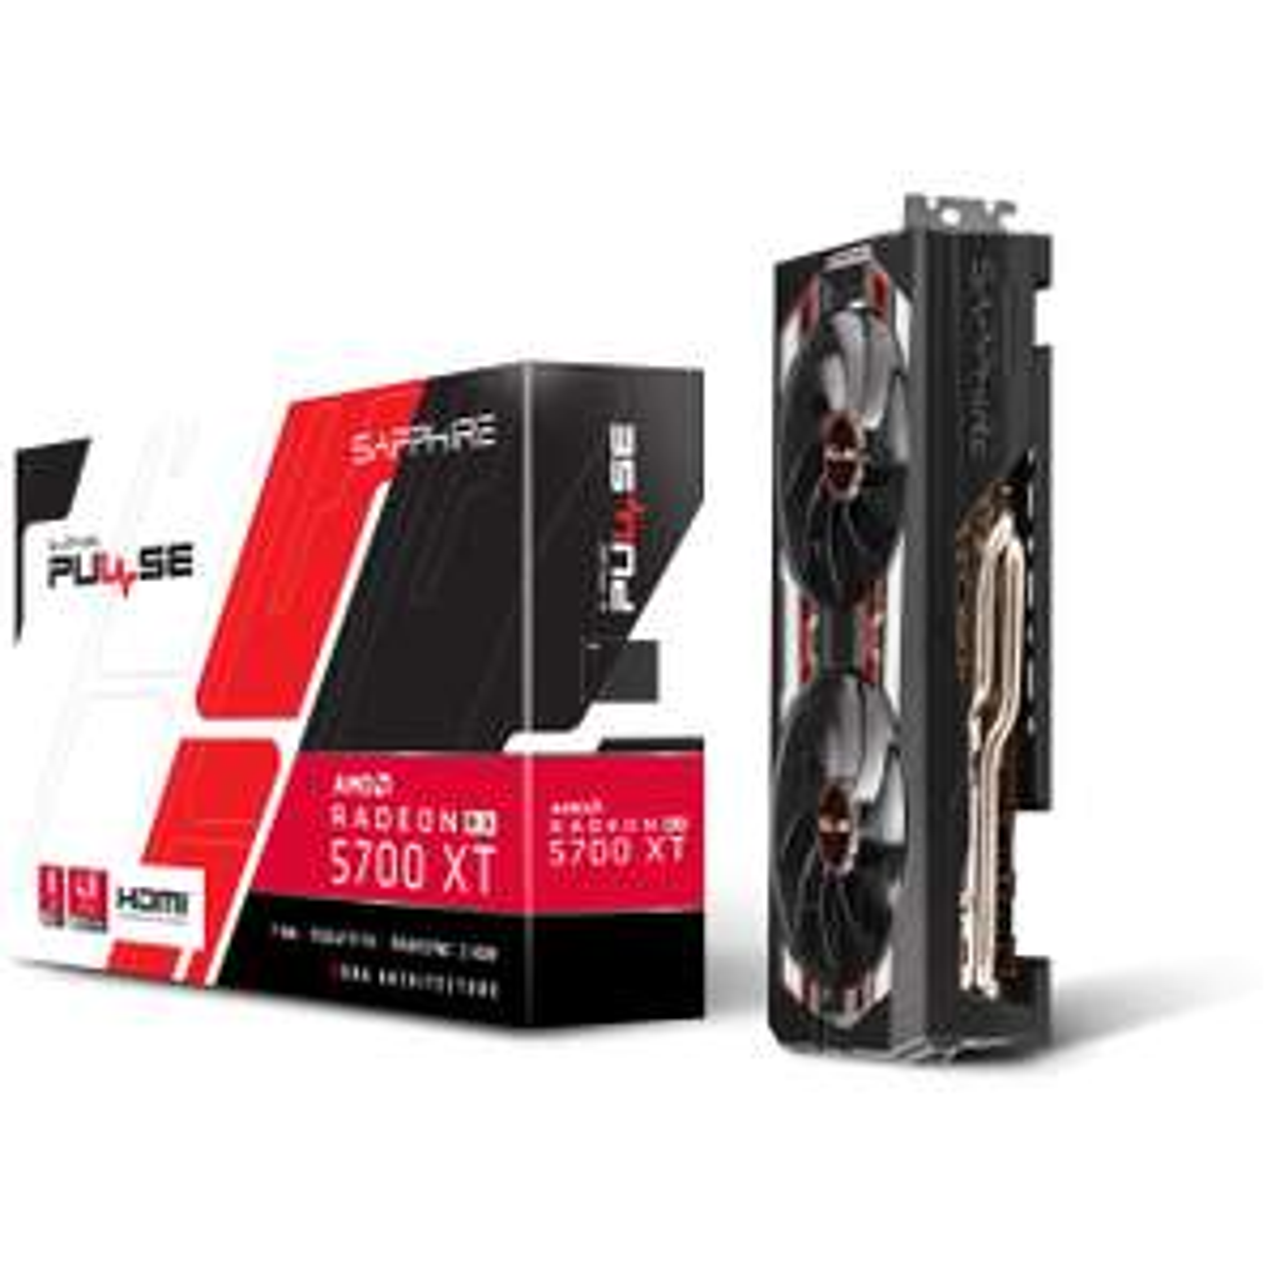 [Mindfactory] Sapphire Pulse Radeon RX 5700 XT 8GB | Grafikkarte